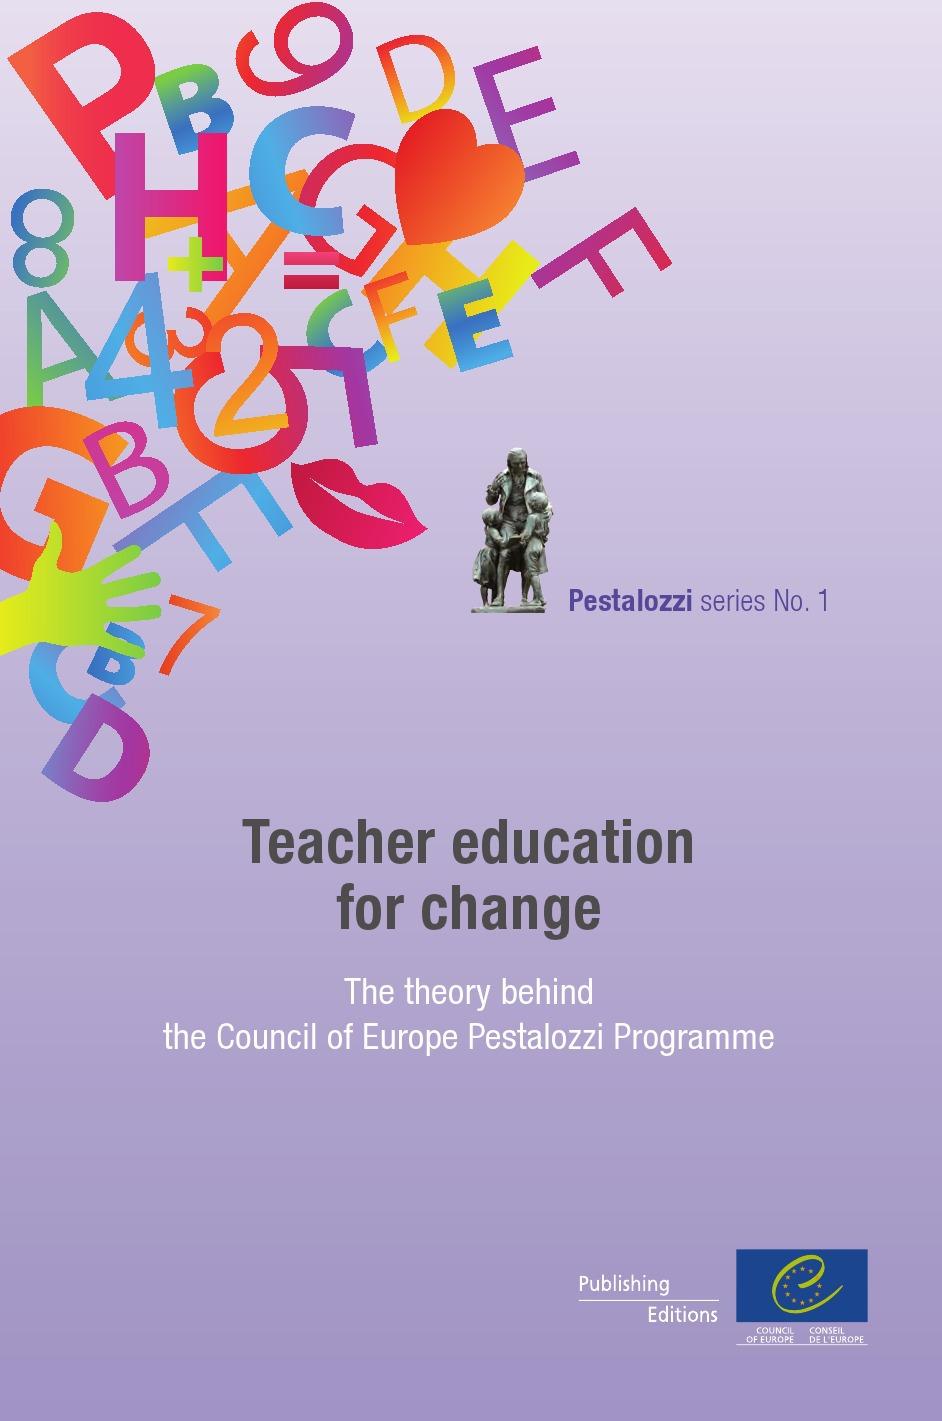 Pestalozzi series t.1 ; teacher education for change ; the theory behind the council of Europe Pestalozzi programme